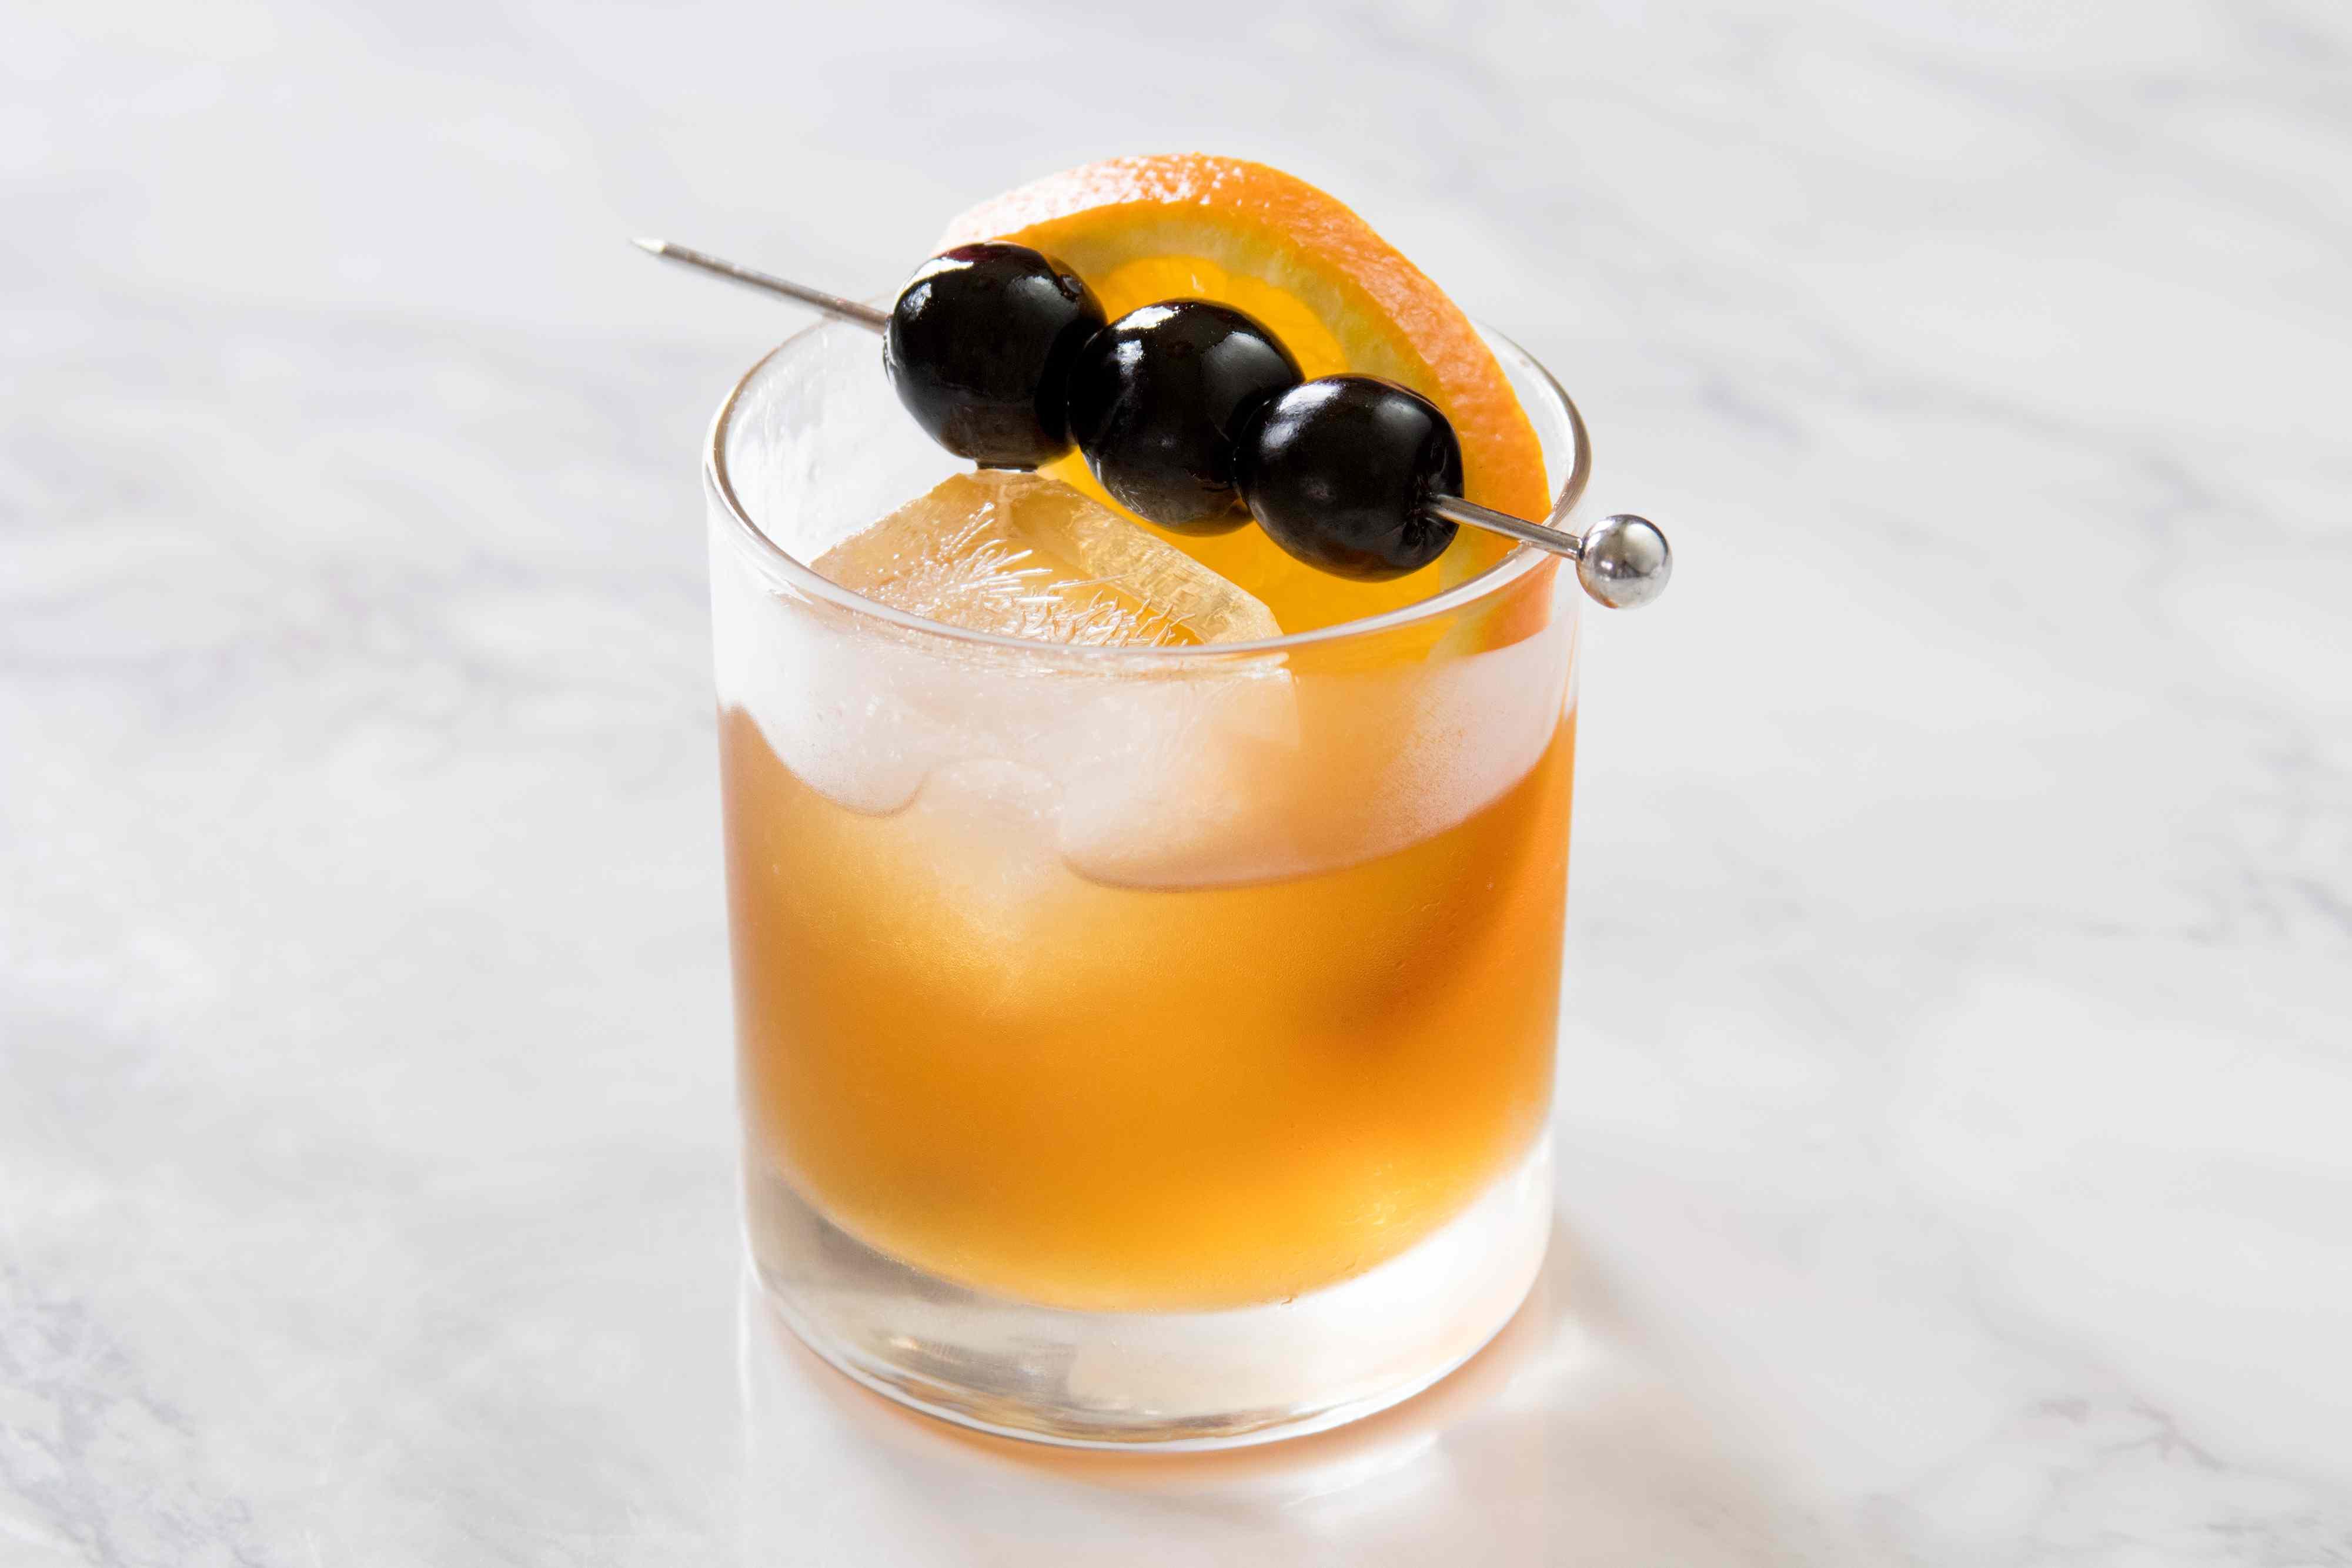 Simple Amaretto Sour With Orange and Cherry Garnish